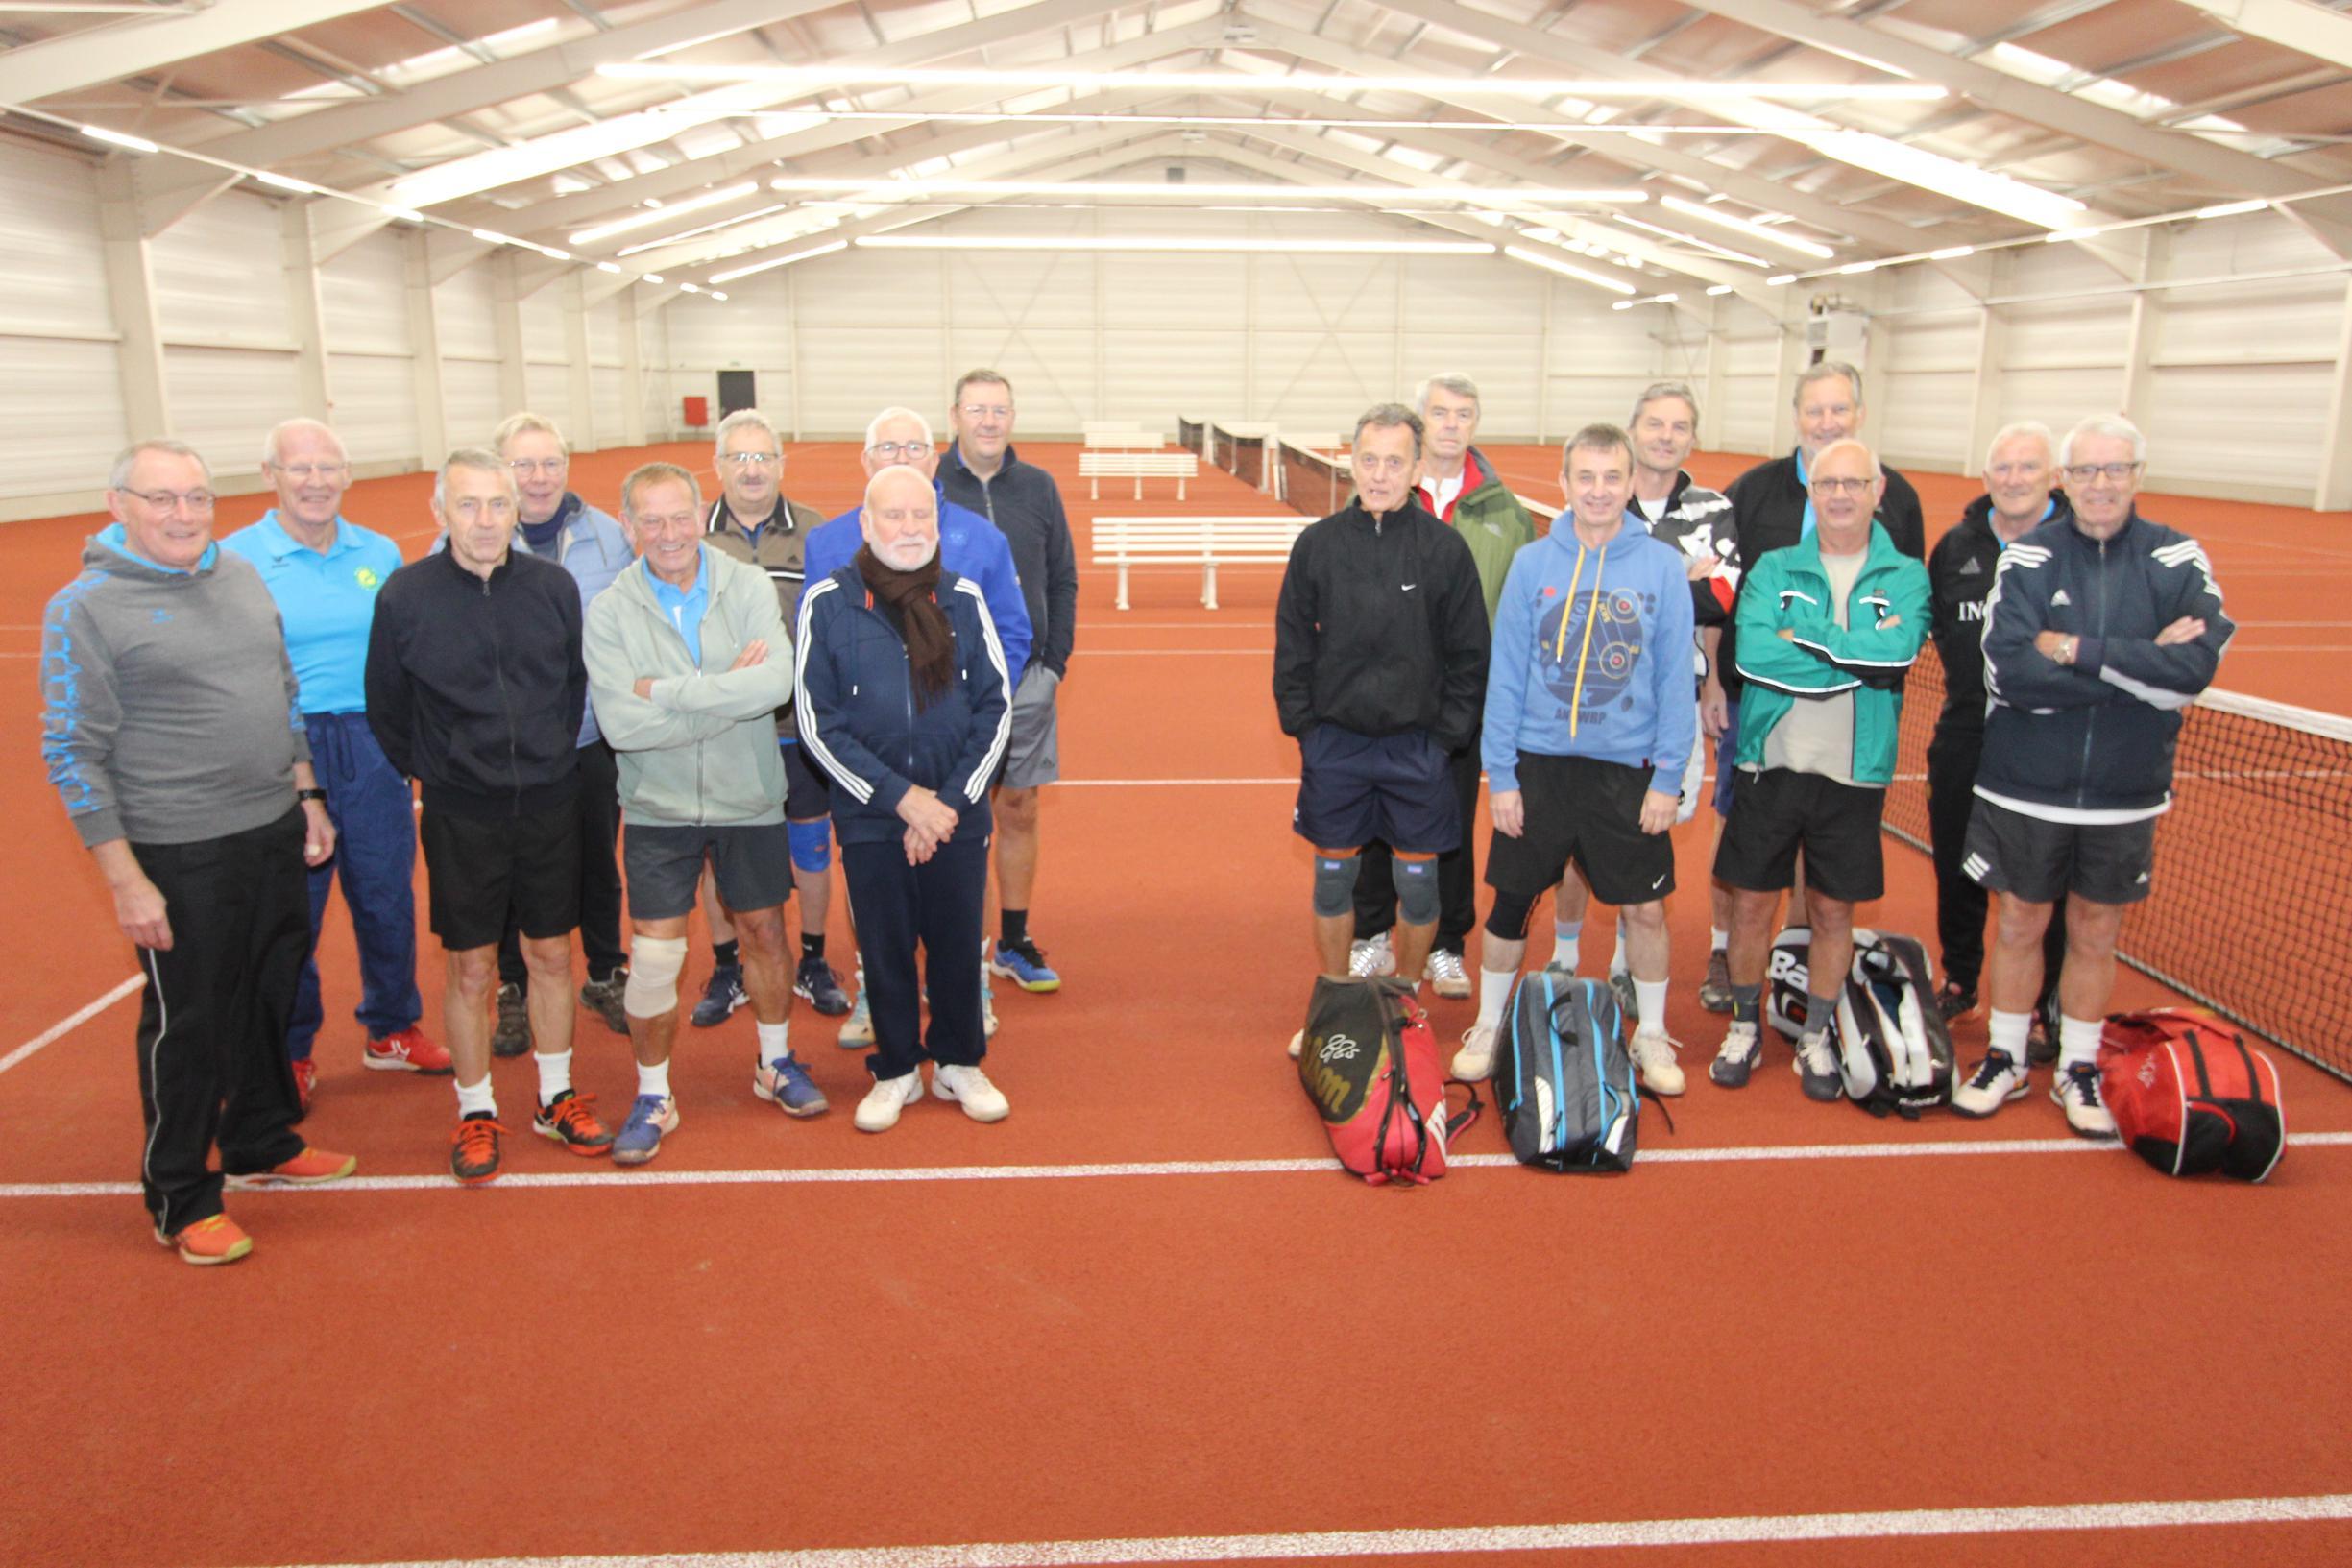 Club opent nieuwe tennishal